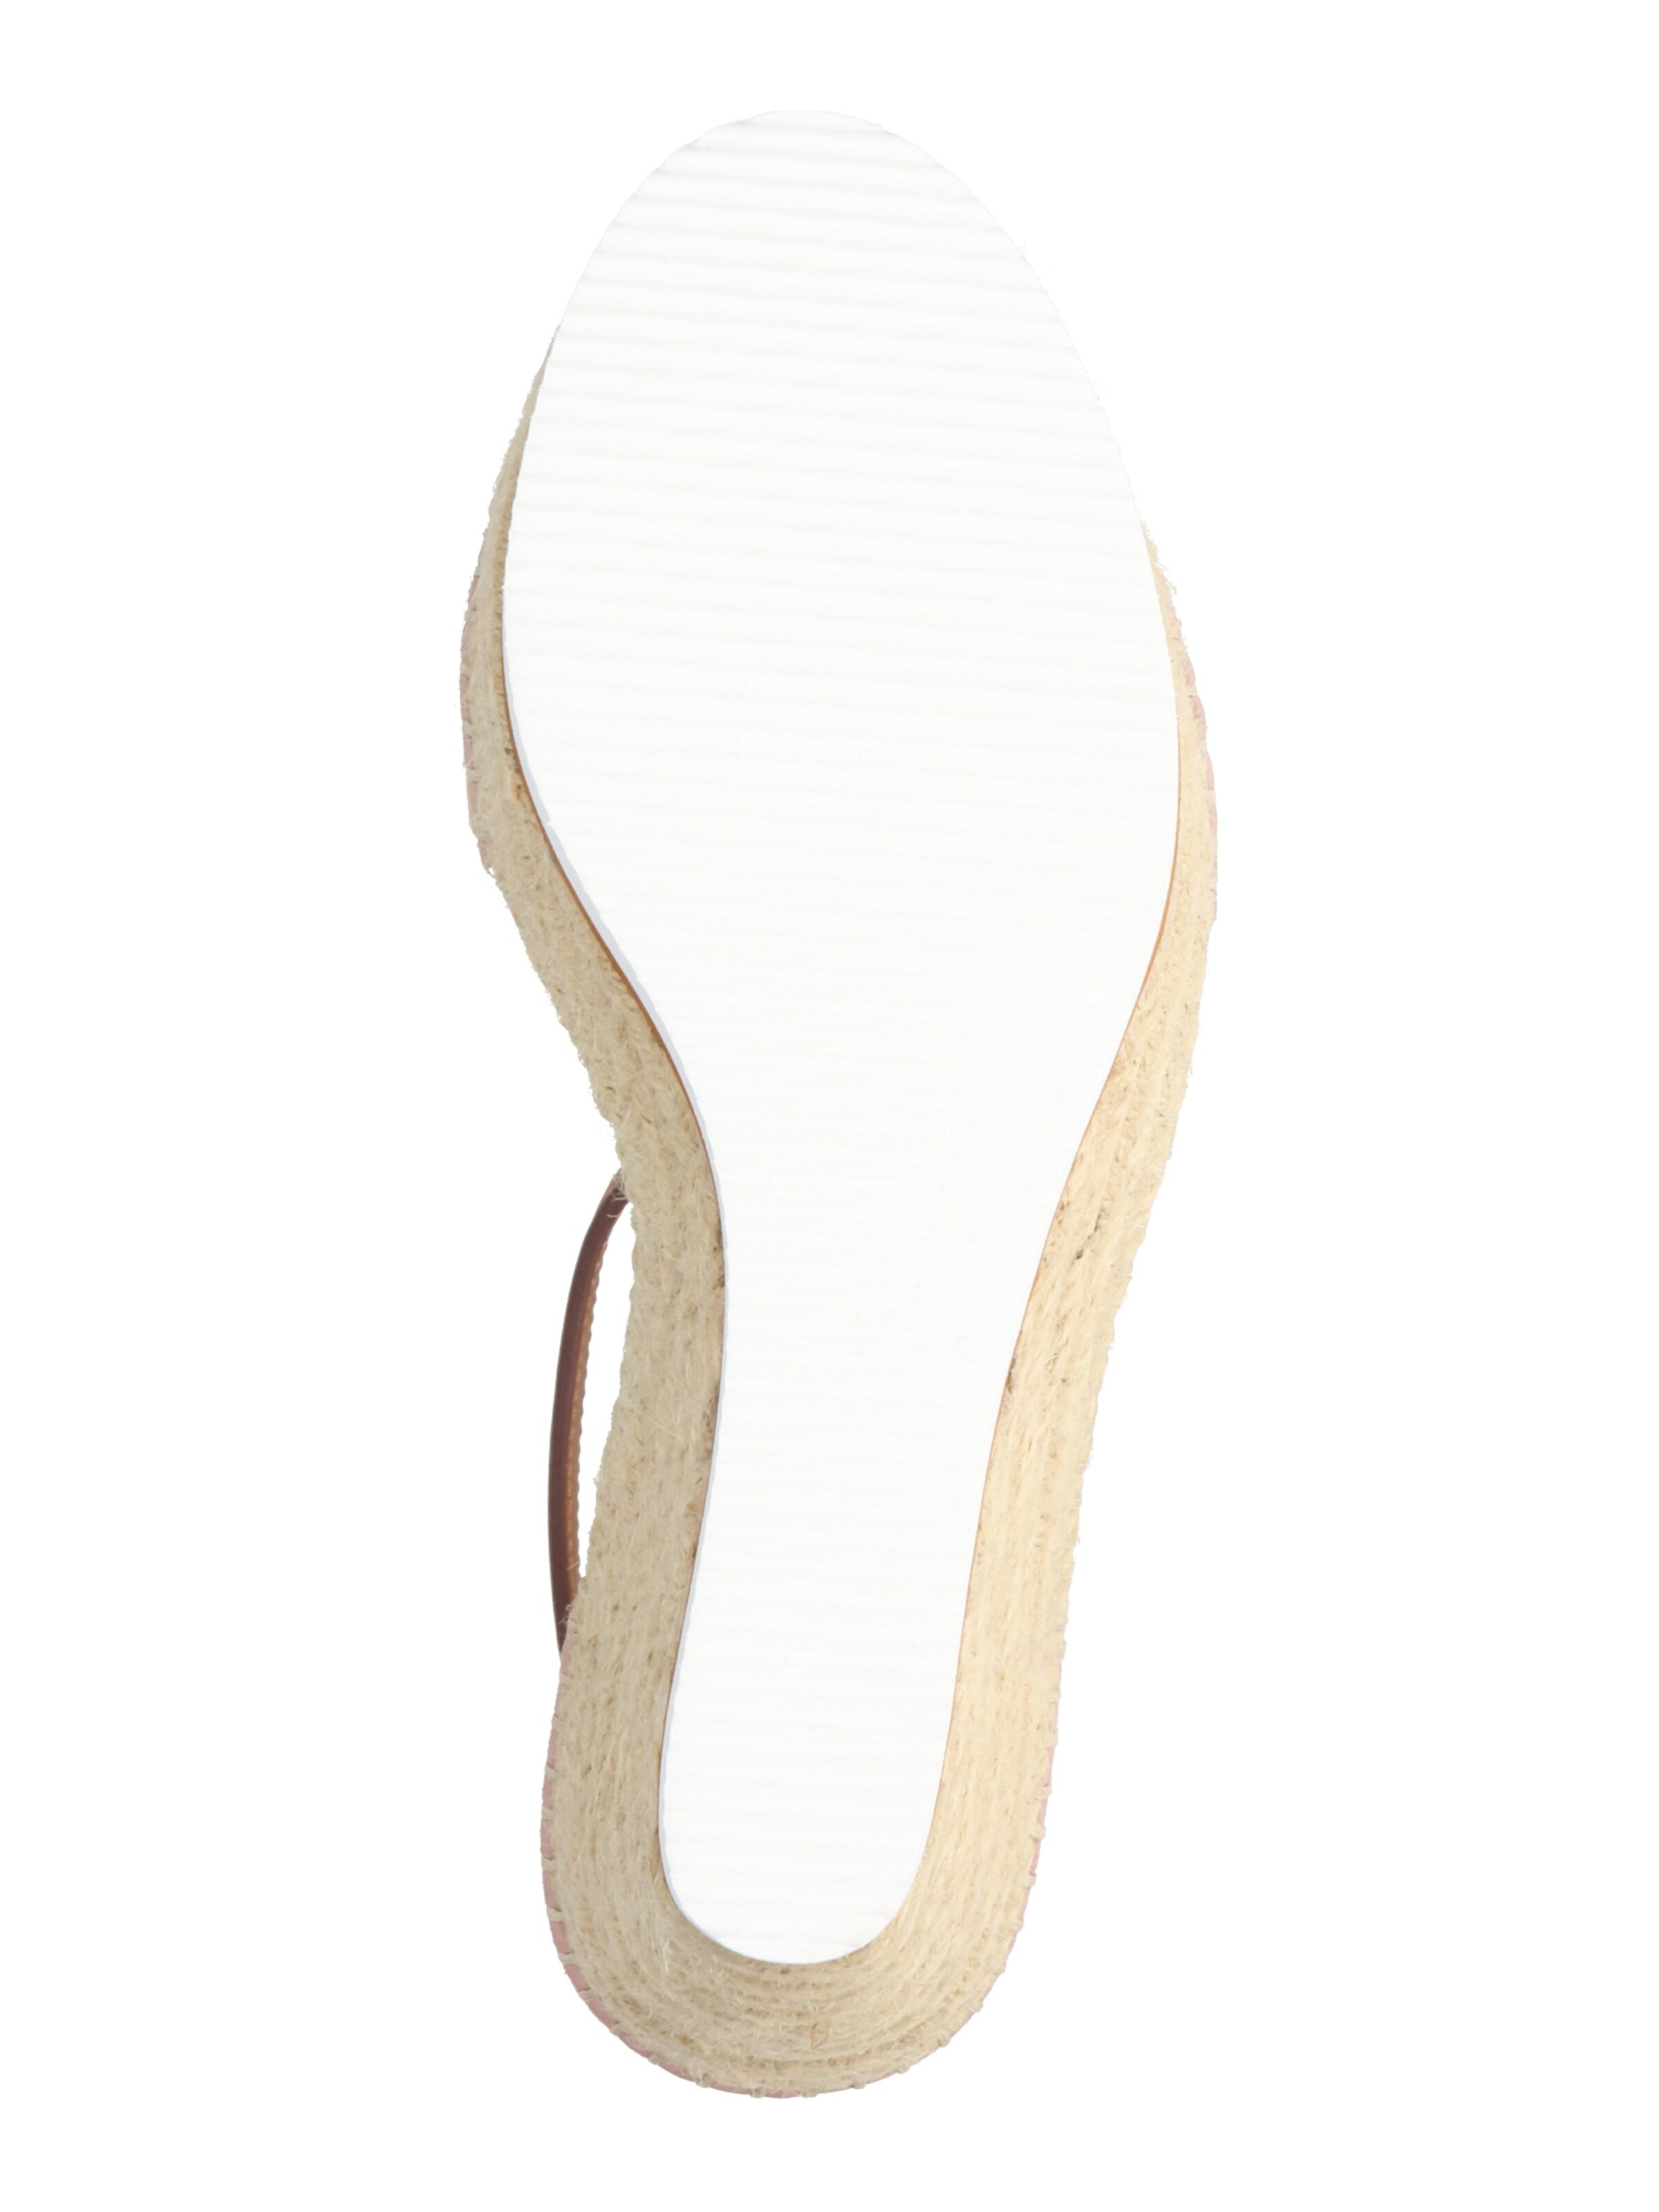 SEE SEE SEE BY CHLOE Sandale 'SB26152 Leder Markenrabatt 23d462